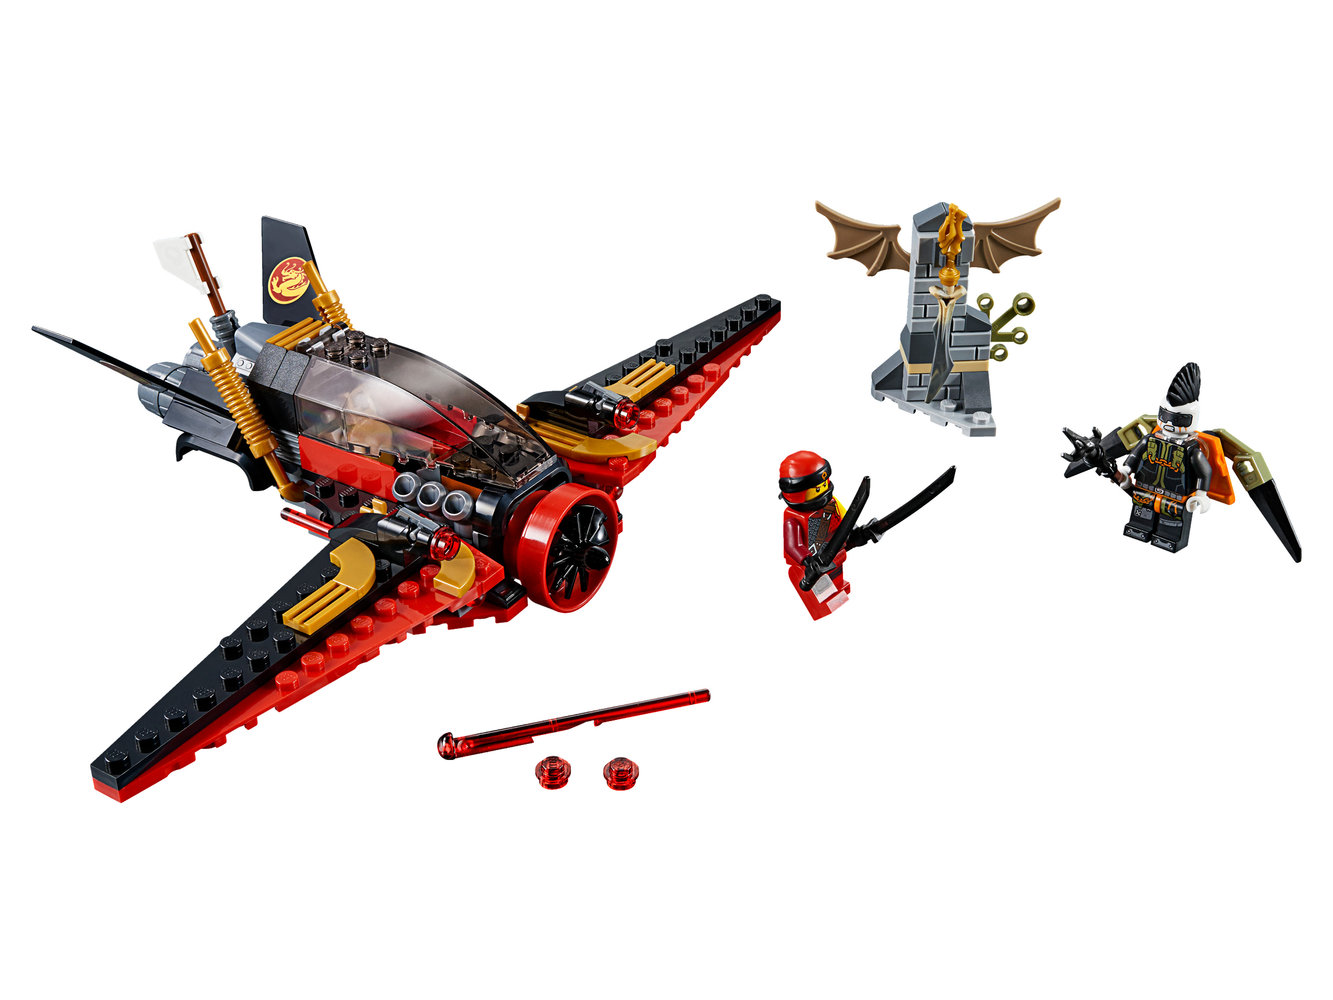 Destiny's Wing